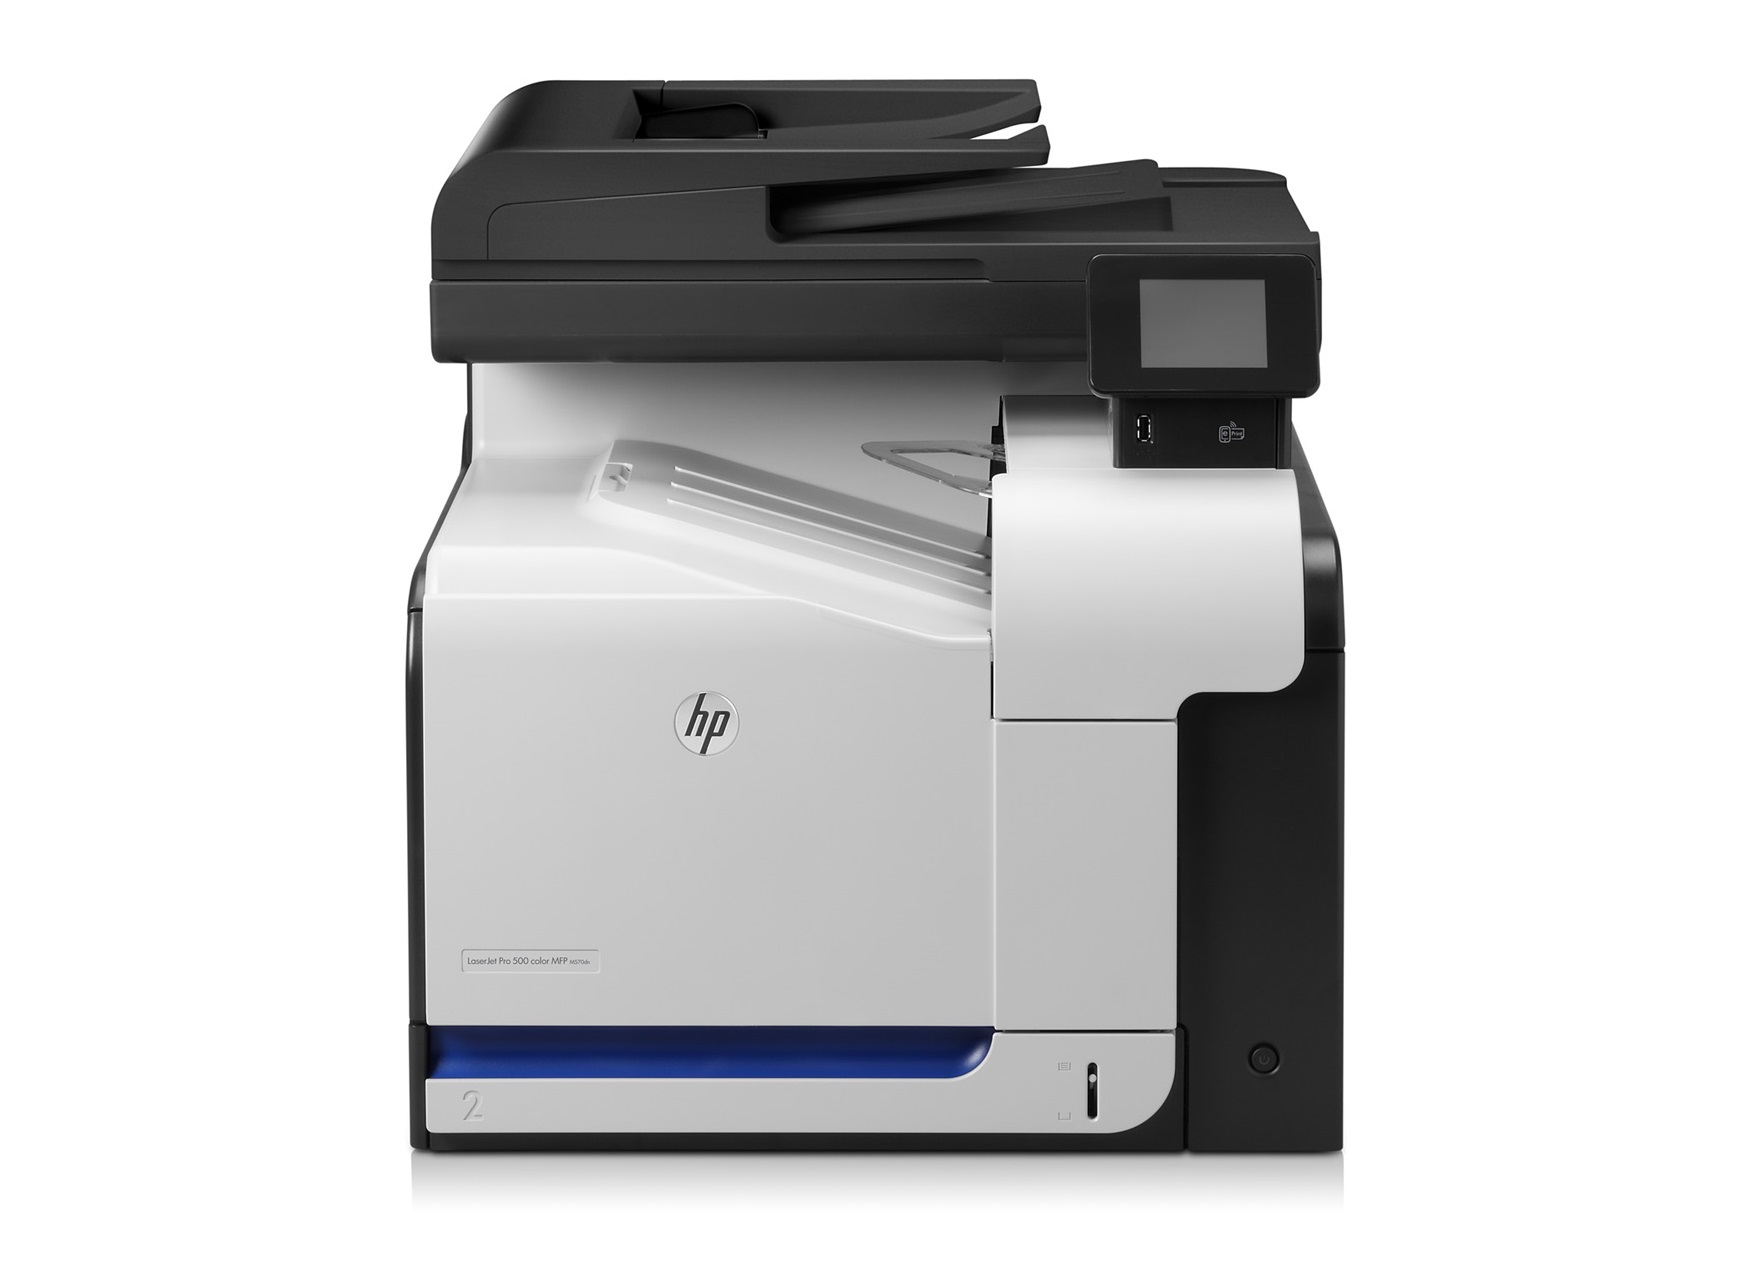 LaserJet Pro M501